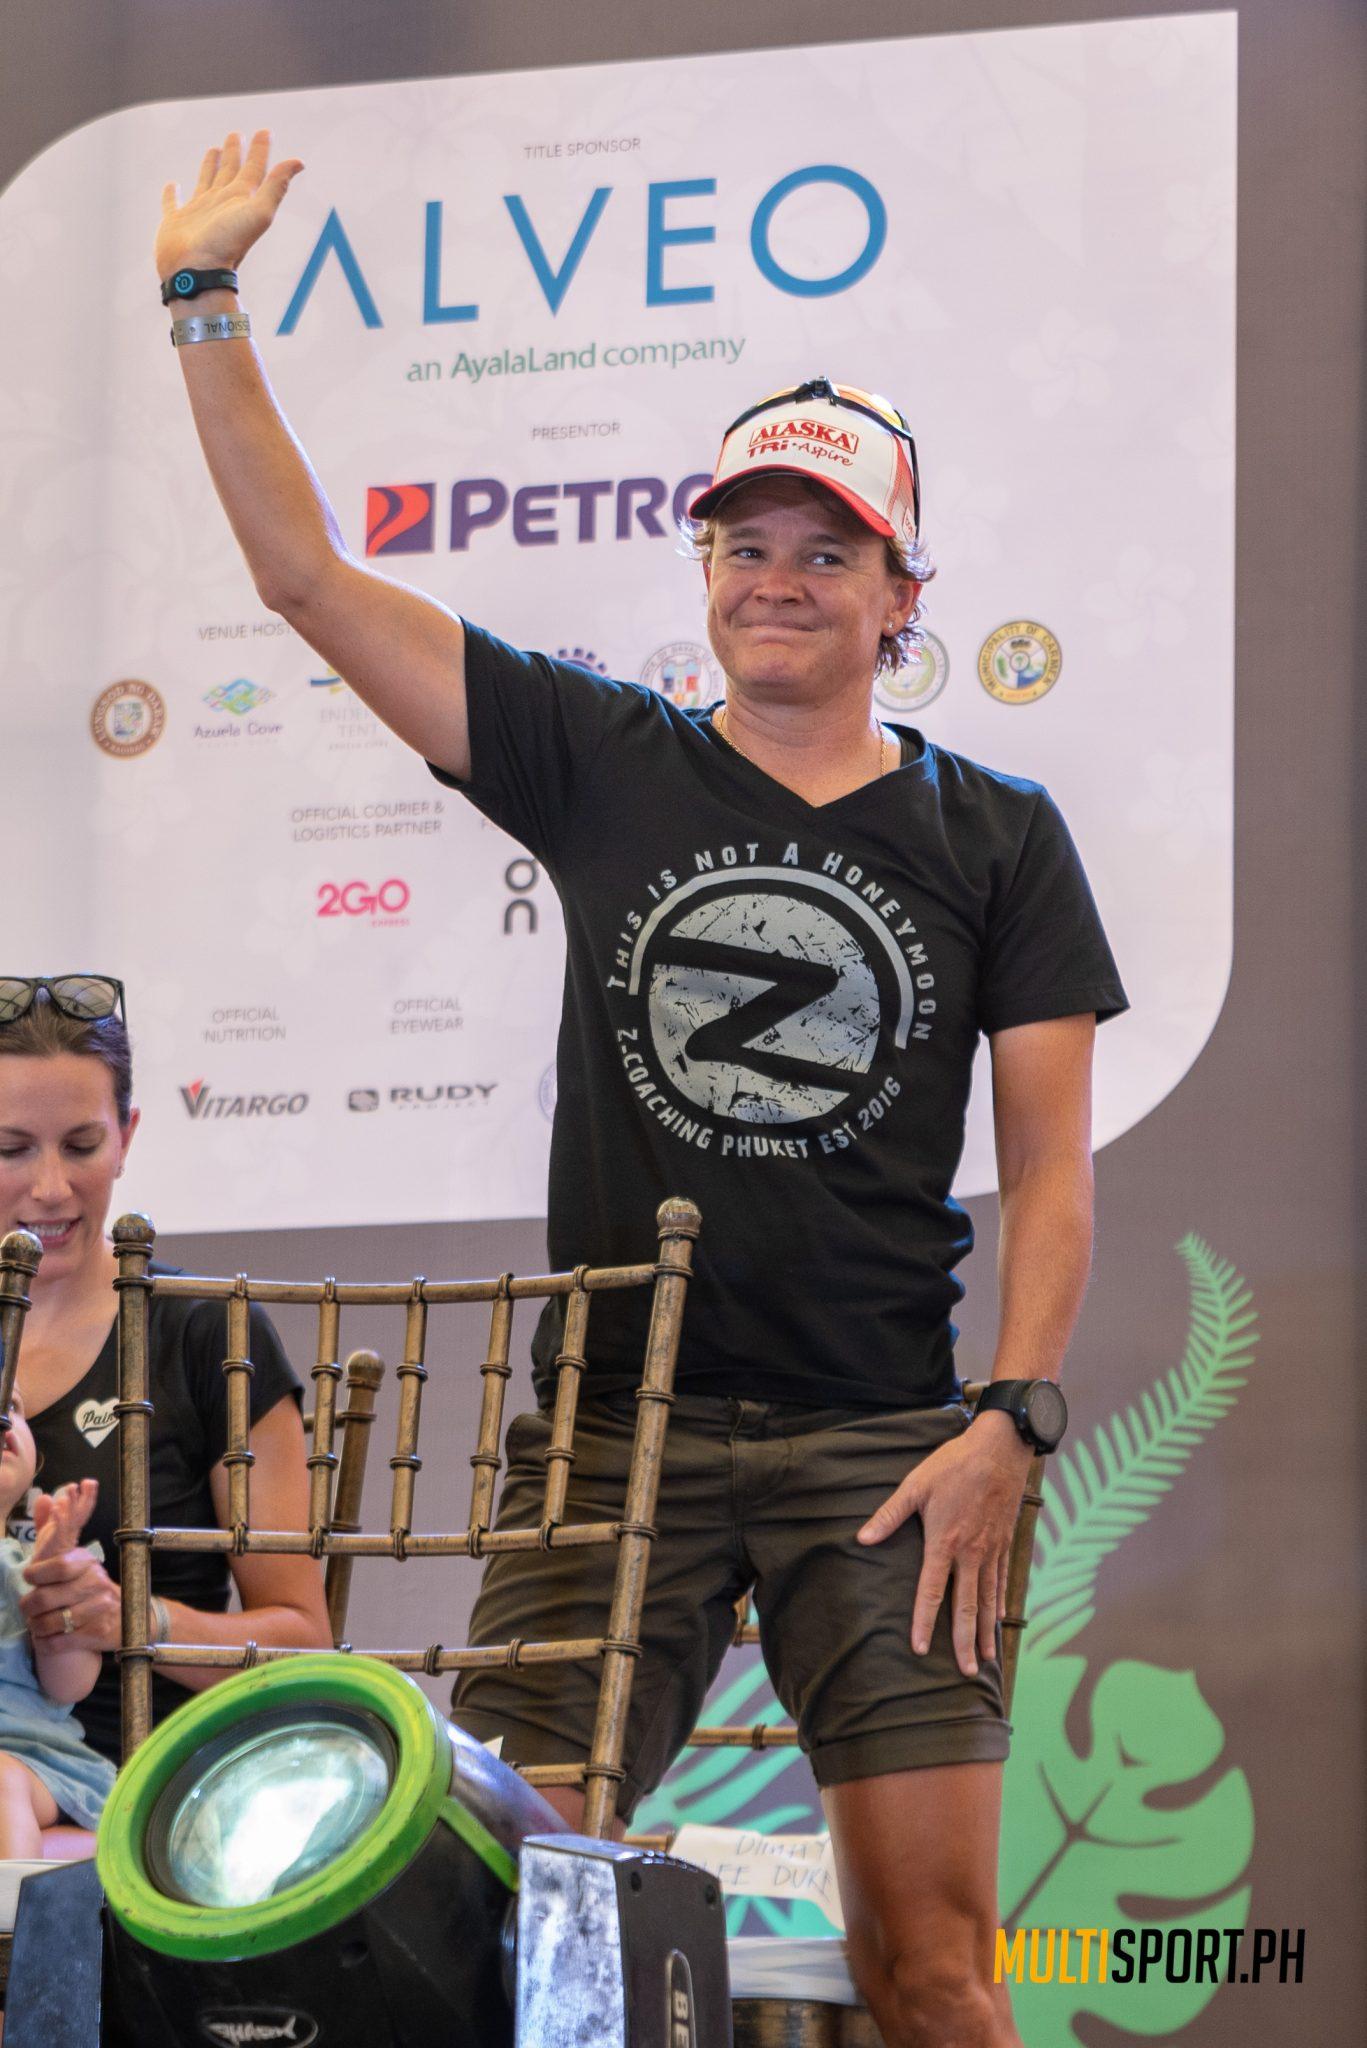 Gallery: 2019 Alveo Ironman 70.3 Davao meet the pros and IronKids swim-run